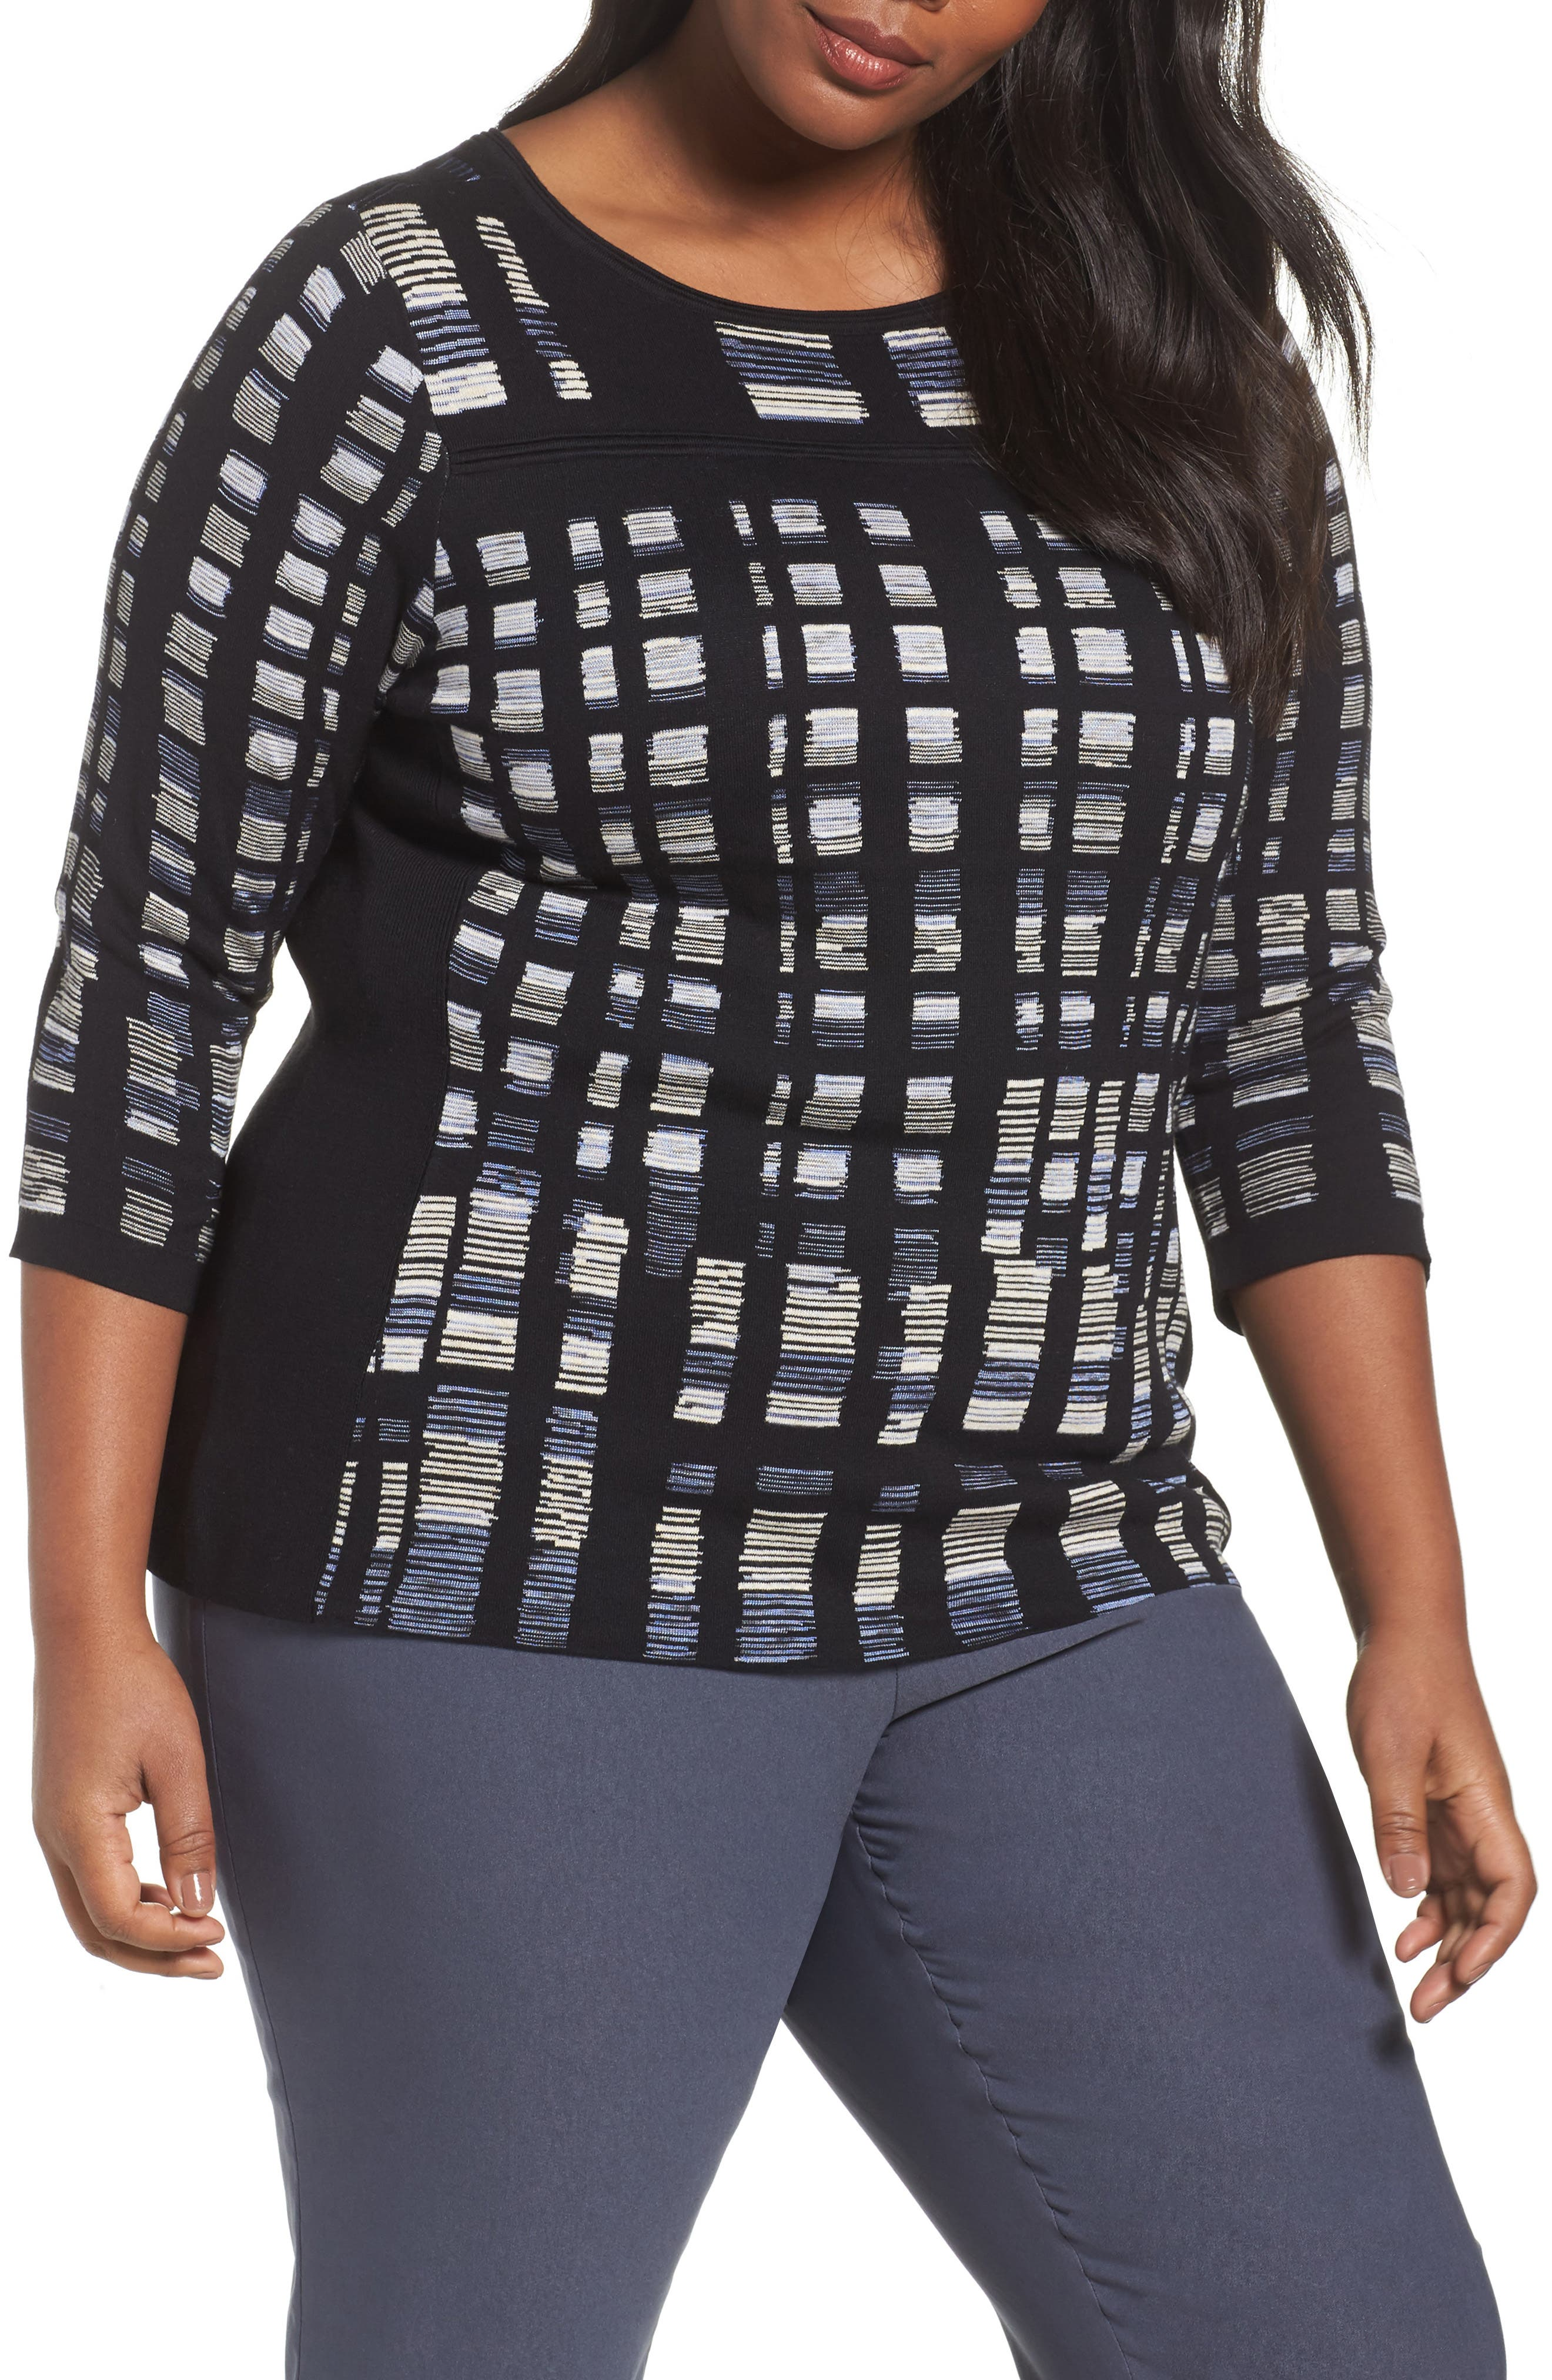 Crystal Cove Sweater,                         Main,                         color, Black Multi